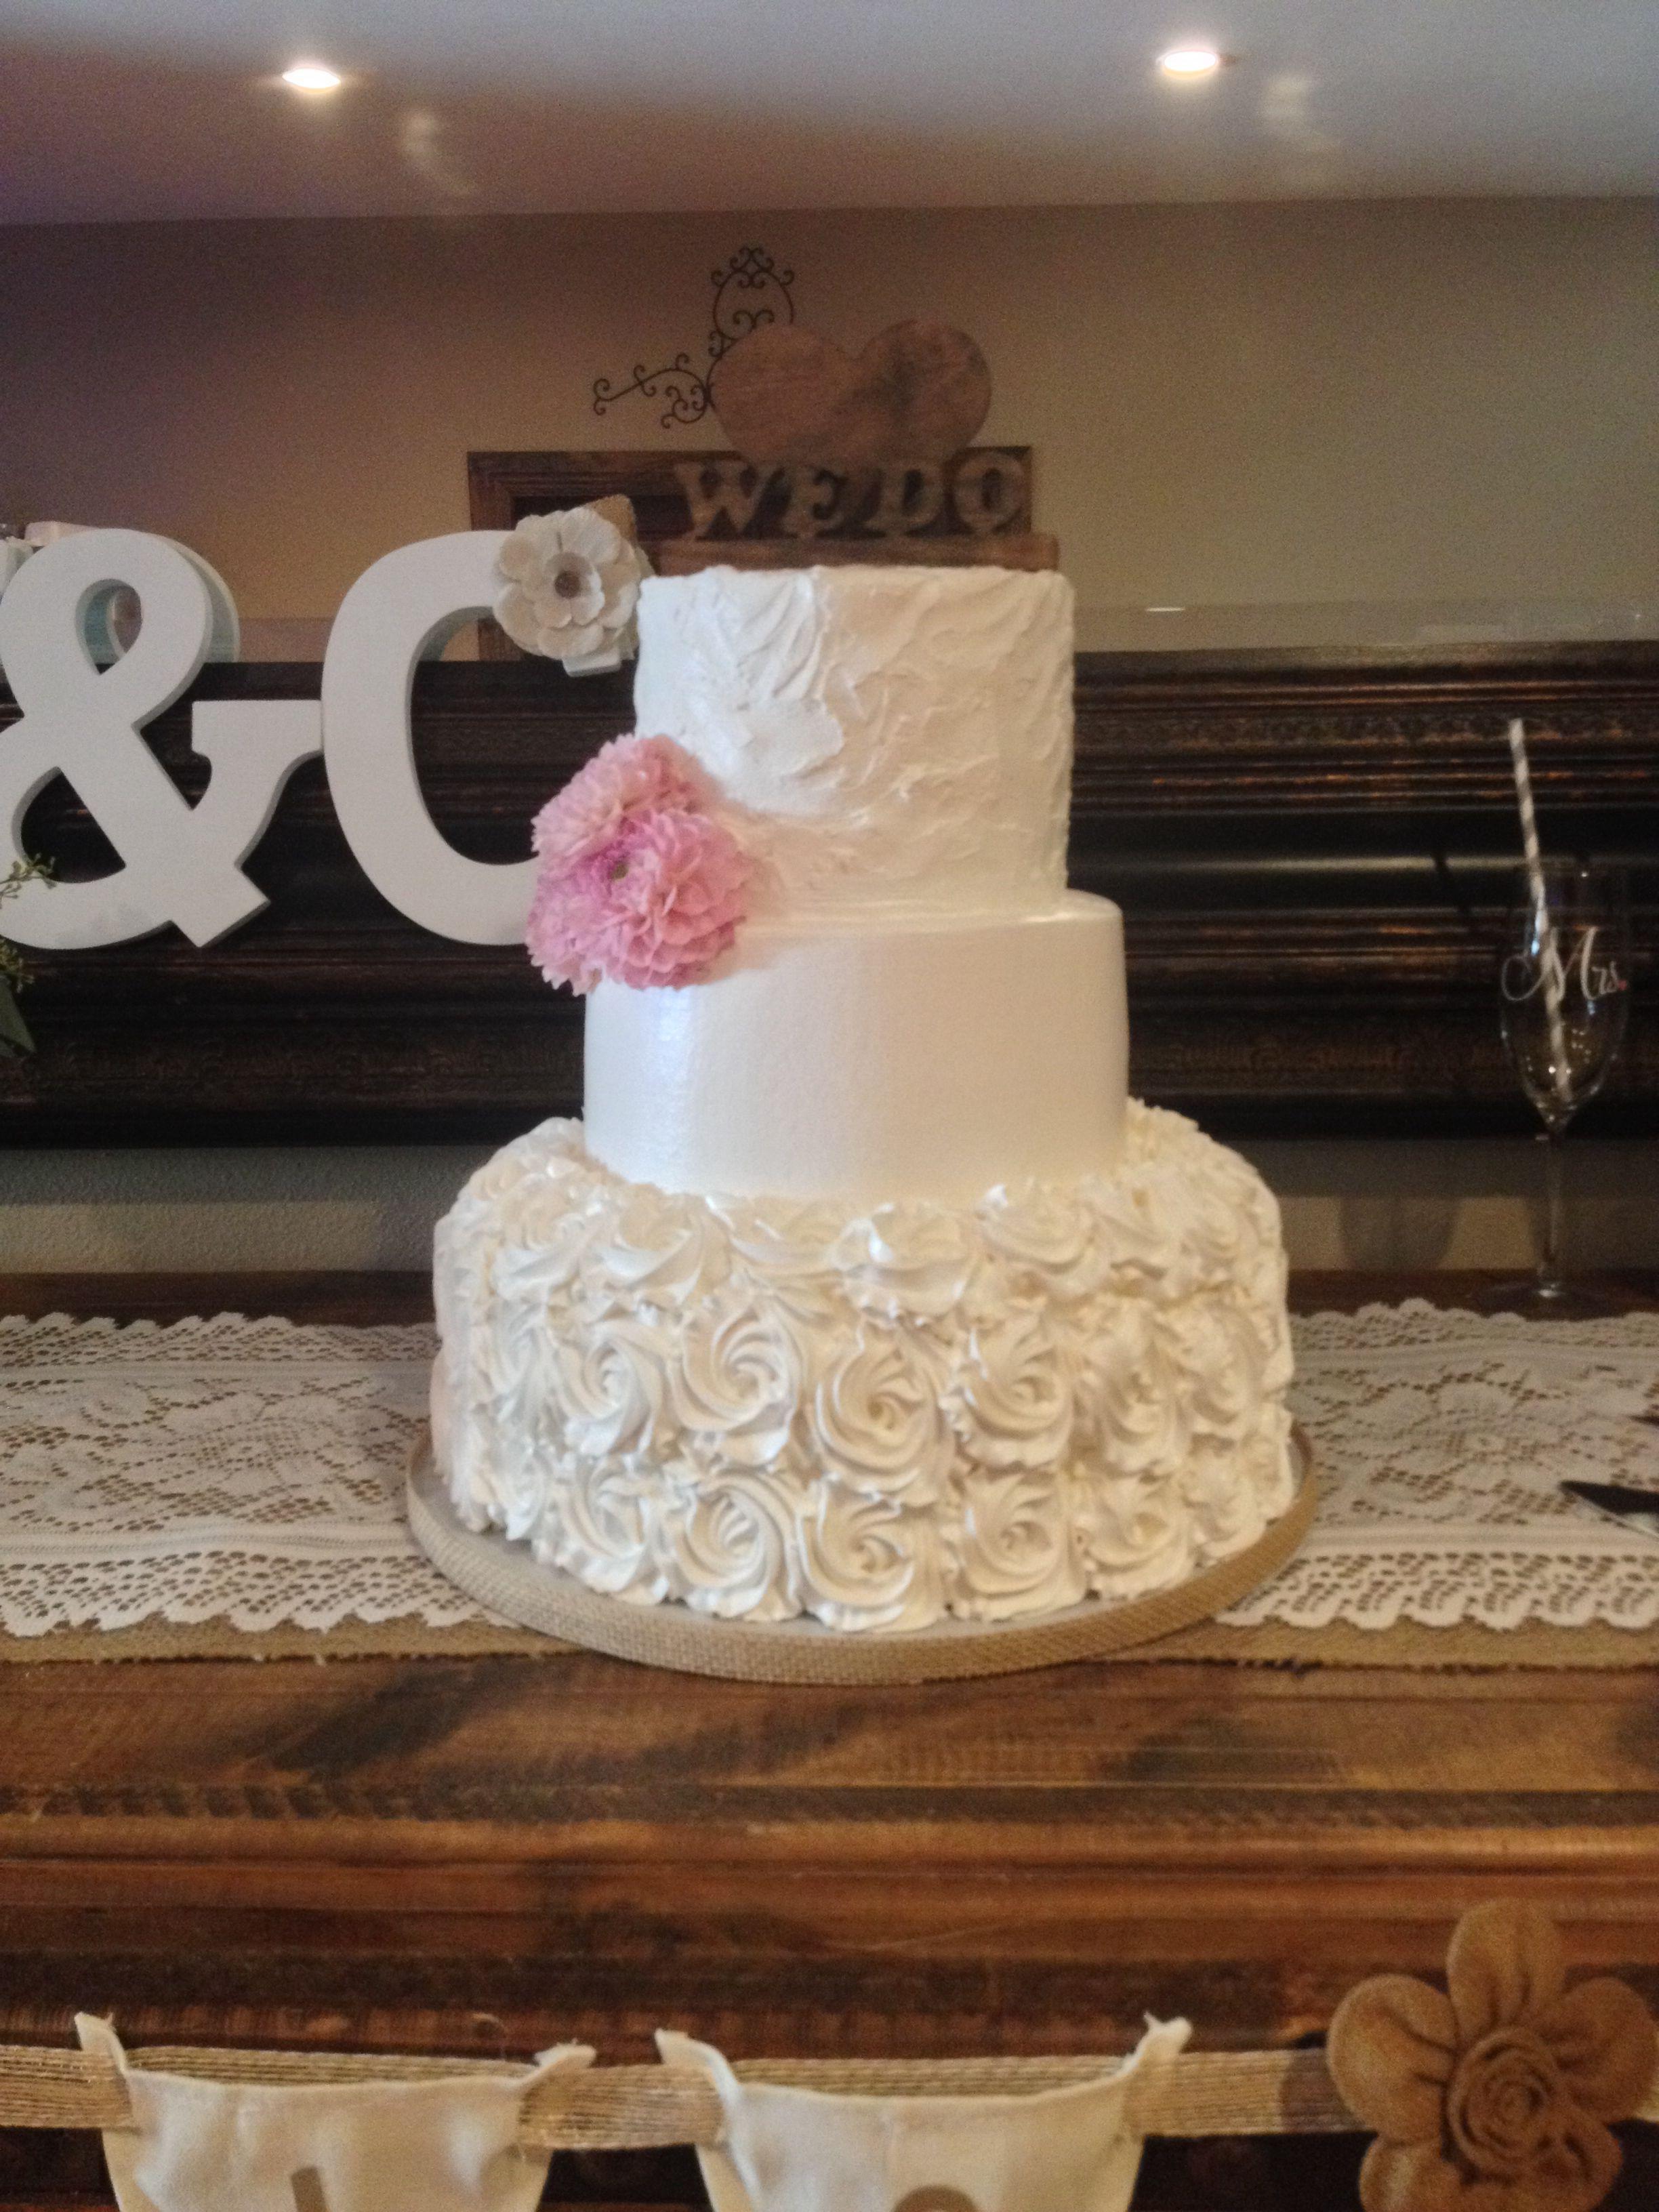 Wedding Cake Rosette Design Pink Flowers Simple Cake Wooden